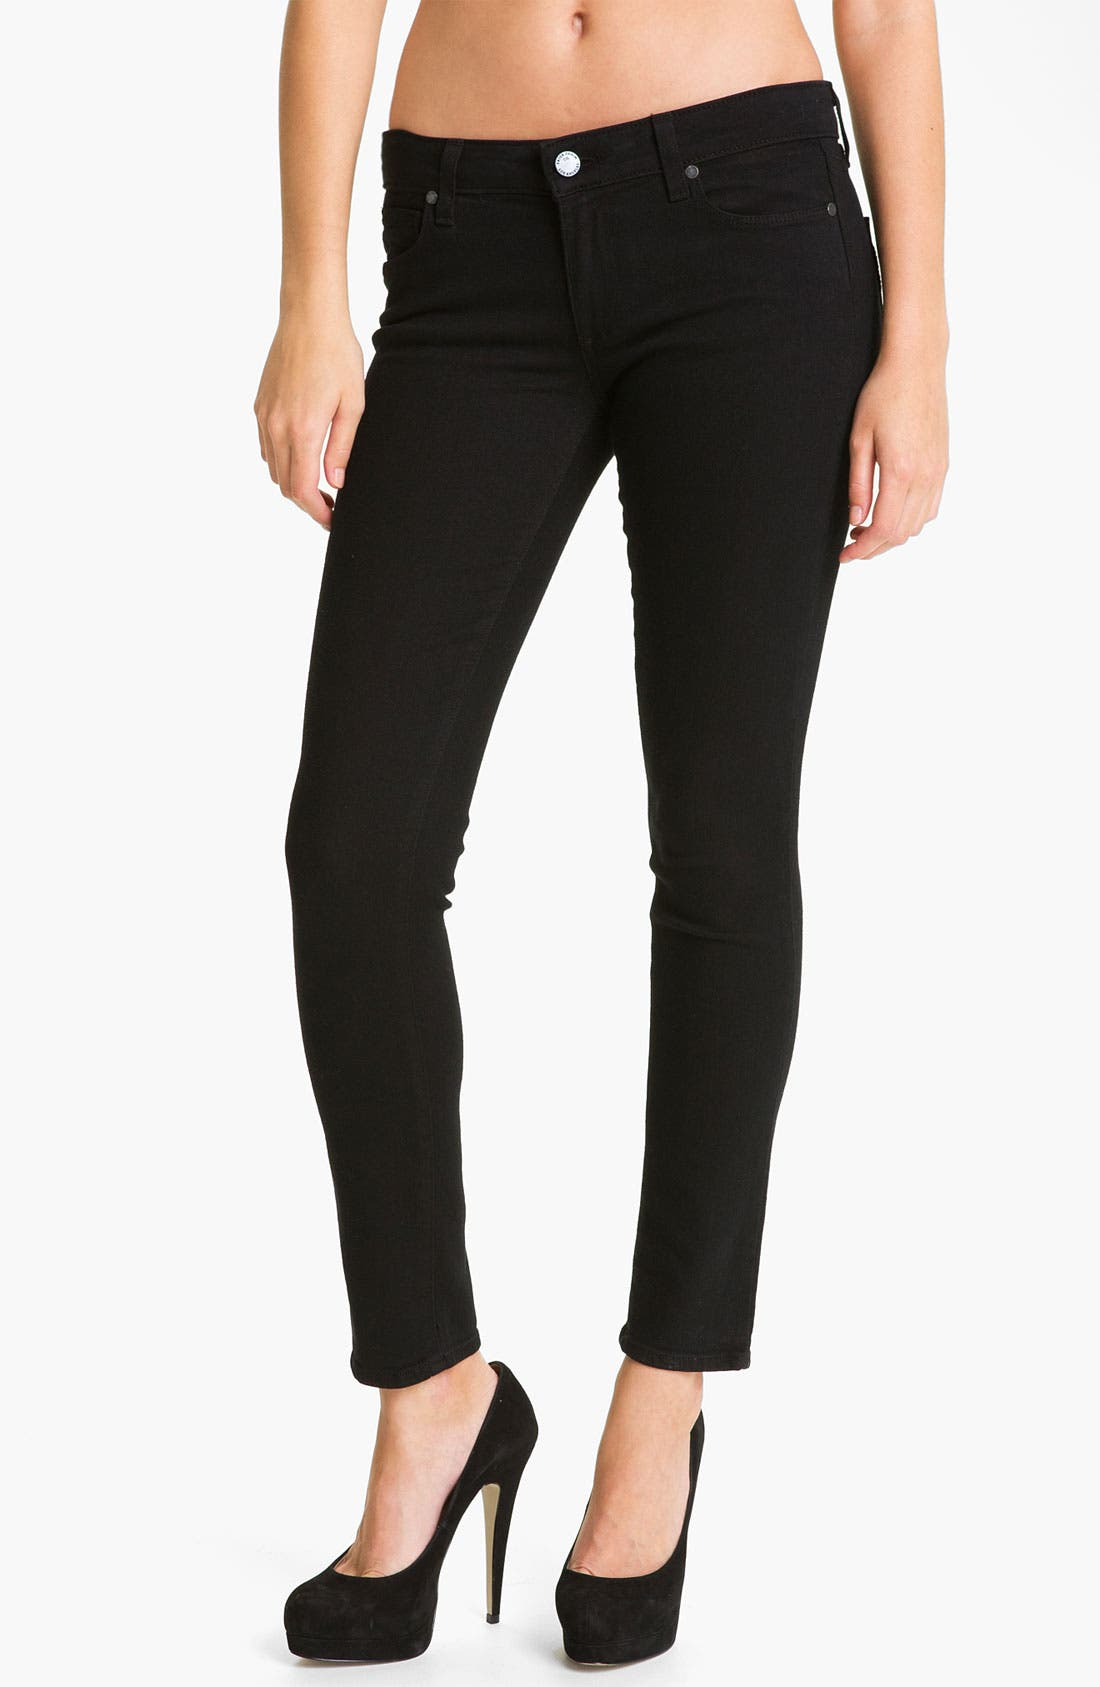 Main Image - Paige Denim 'Skyline' Ankle Peg Skinny Stretch Jeans (Black Ink)